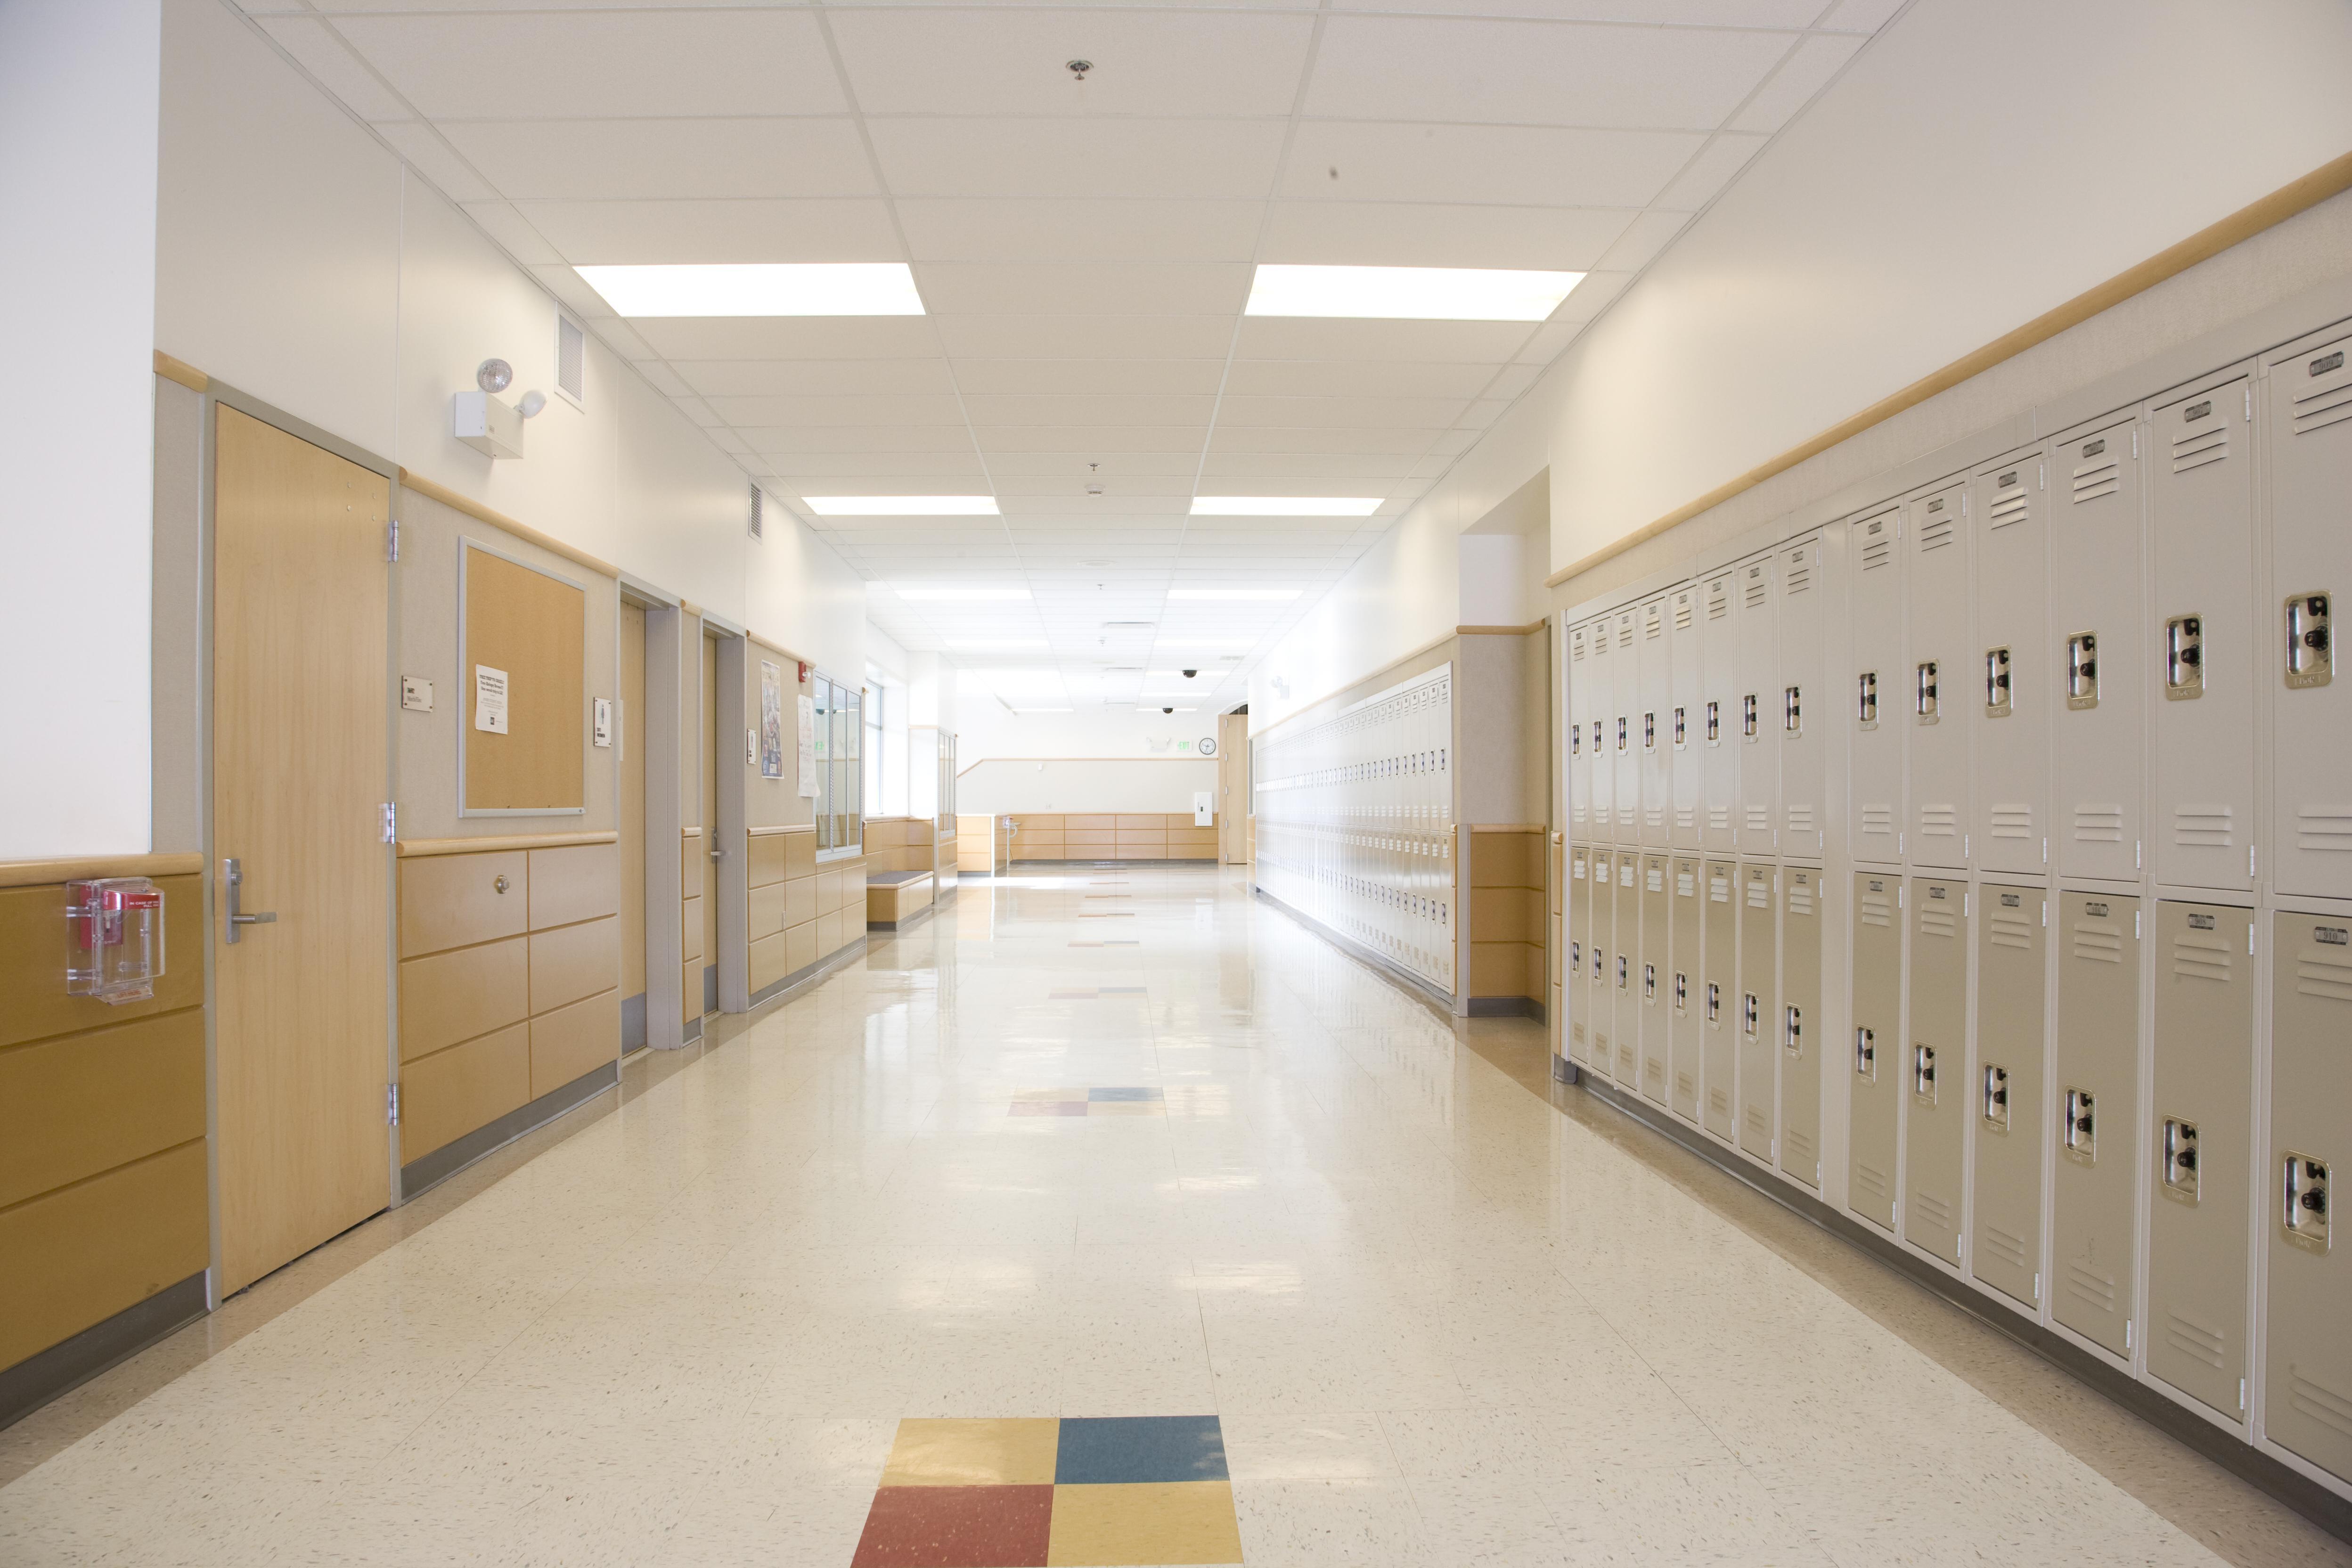 High School Bathroom teenager dies after highschool bathroom fight! | k97.5